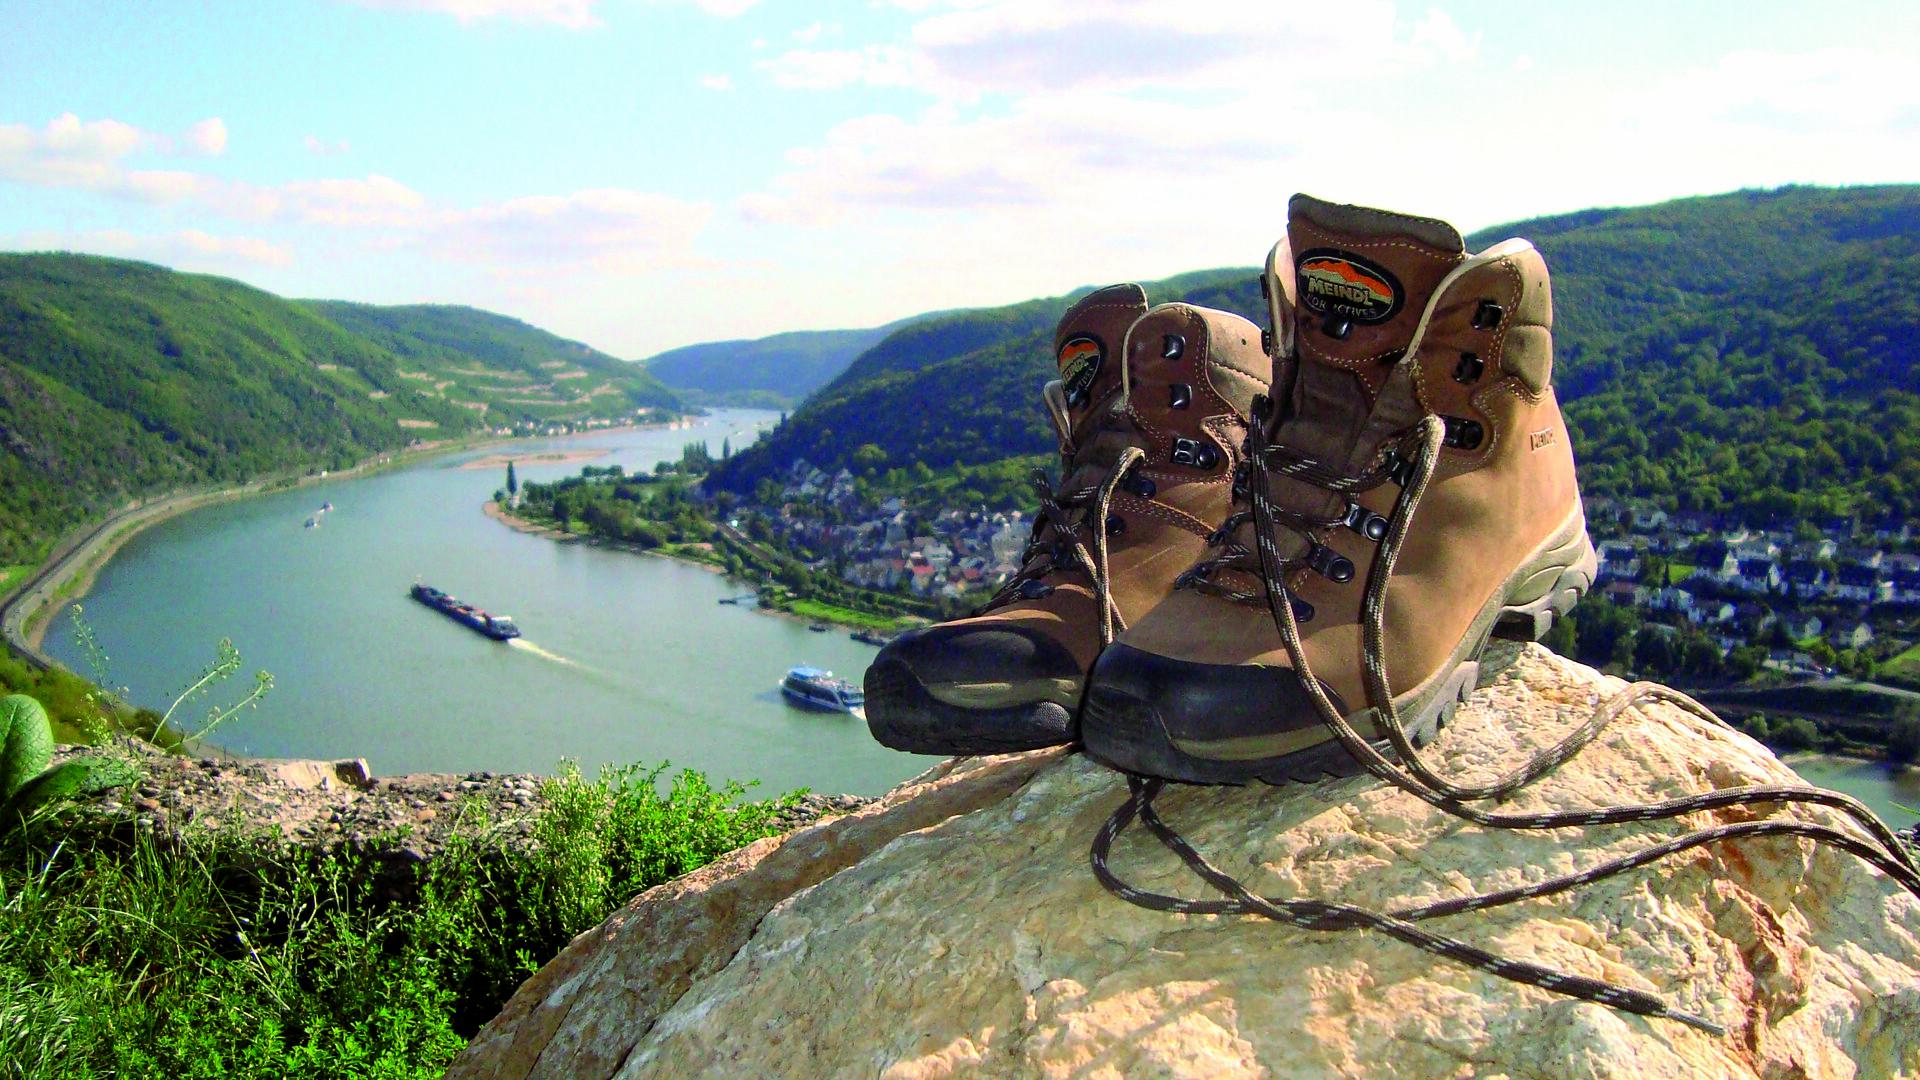 Wanderschuhe mit Rheinblick